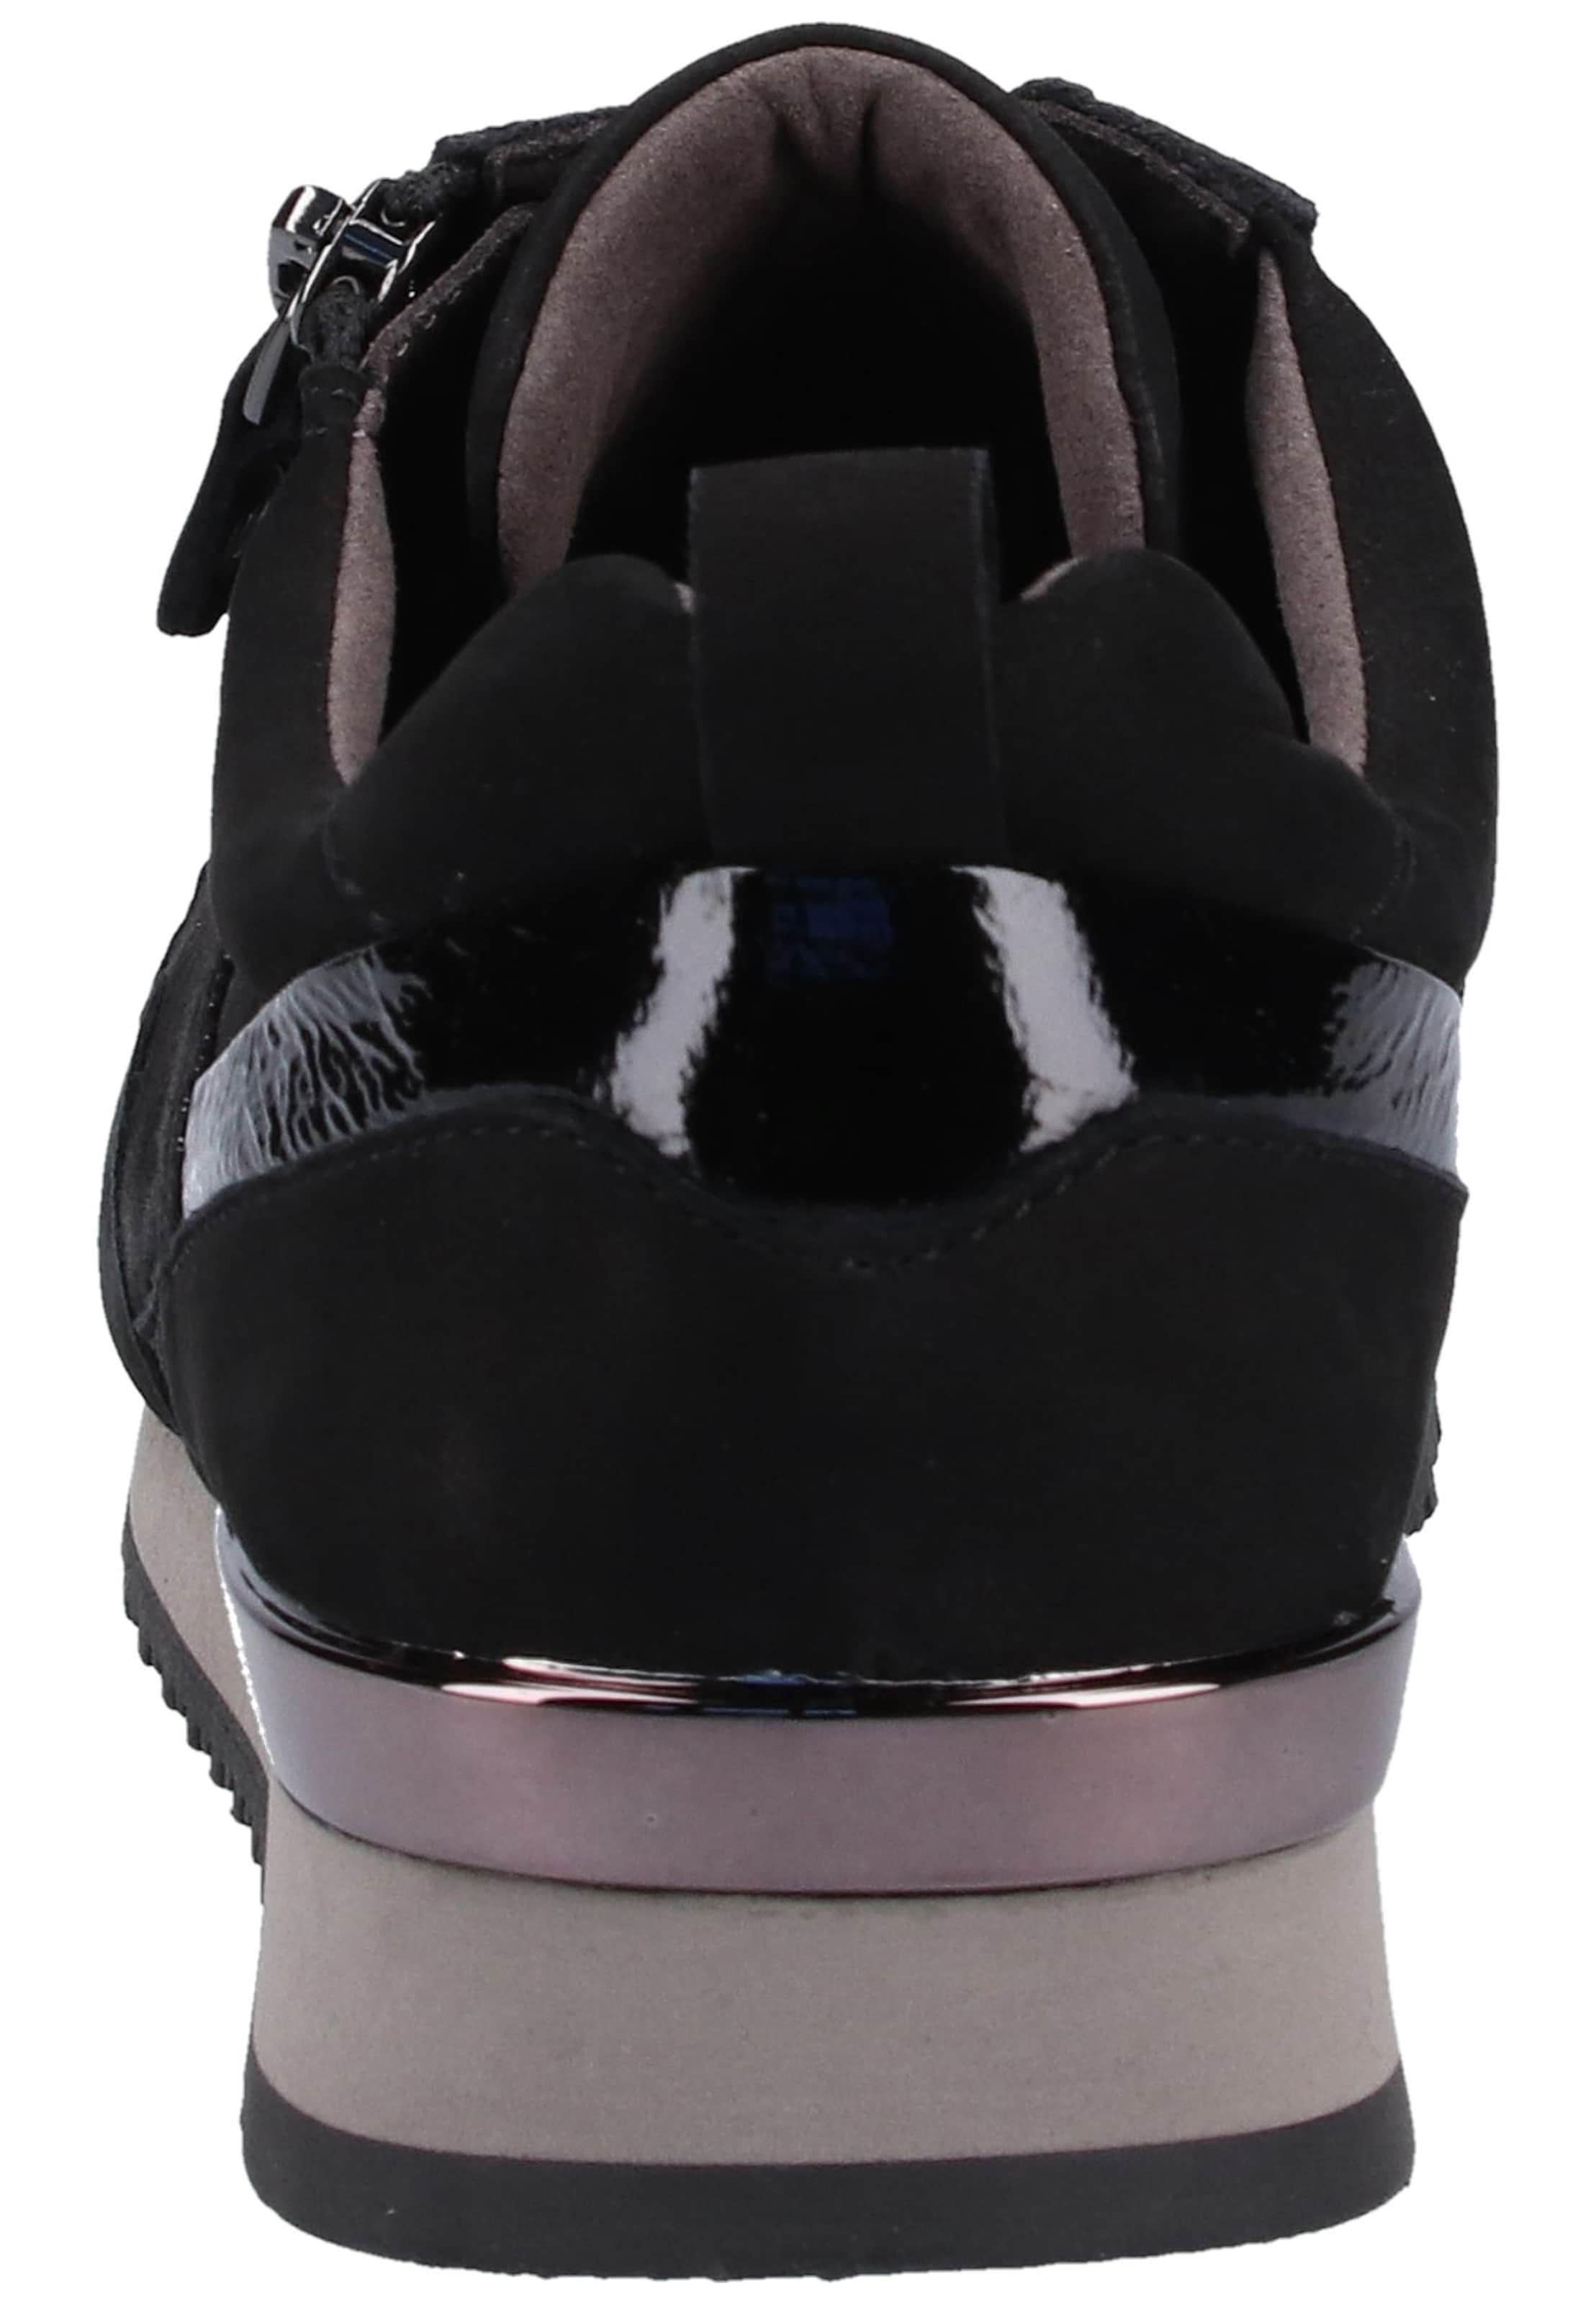 En Basses 'ginga' Noir Caprice Baskets 7mfyv6IYbg